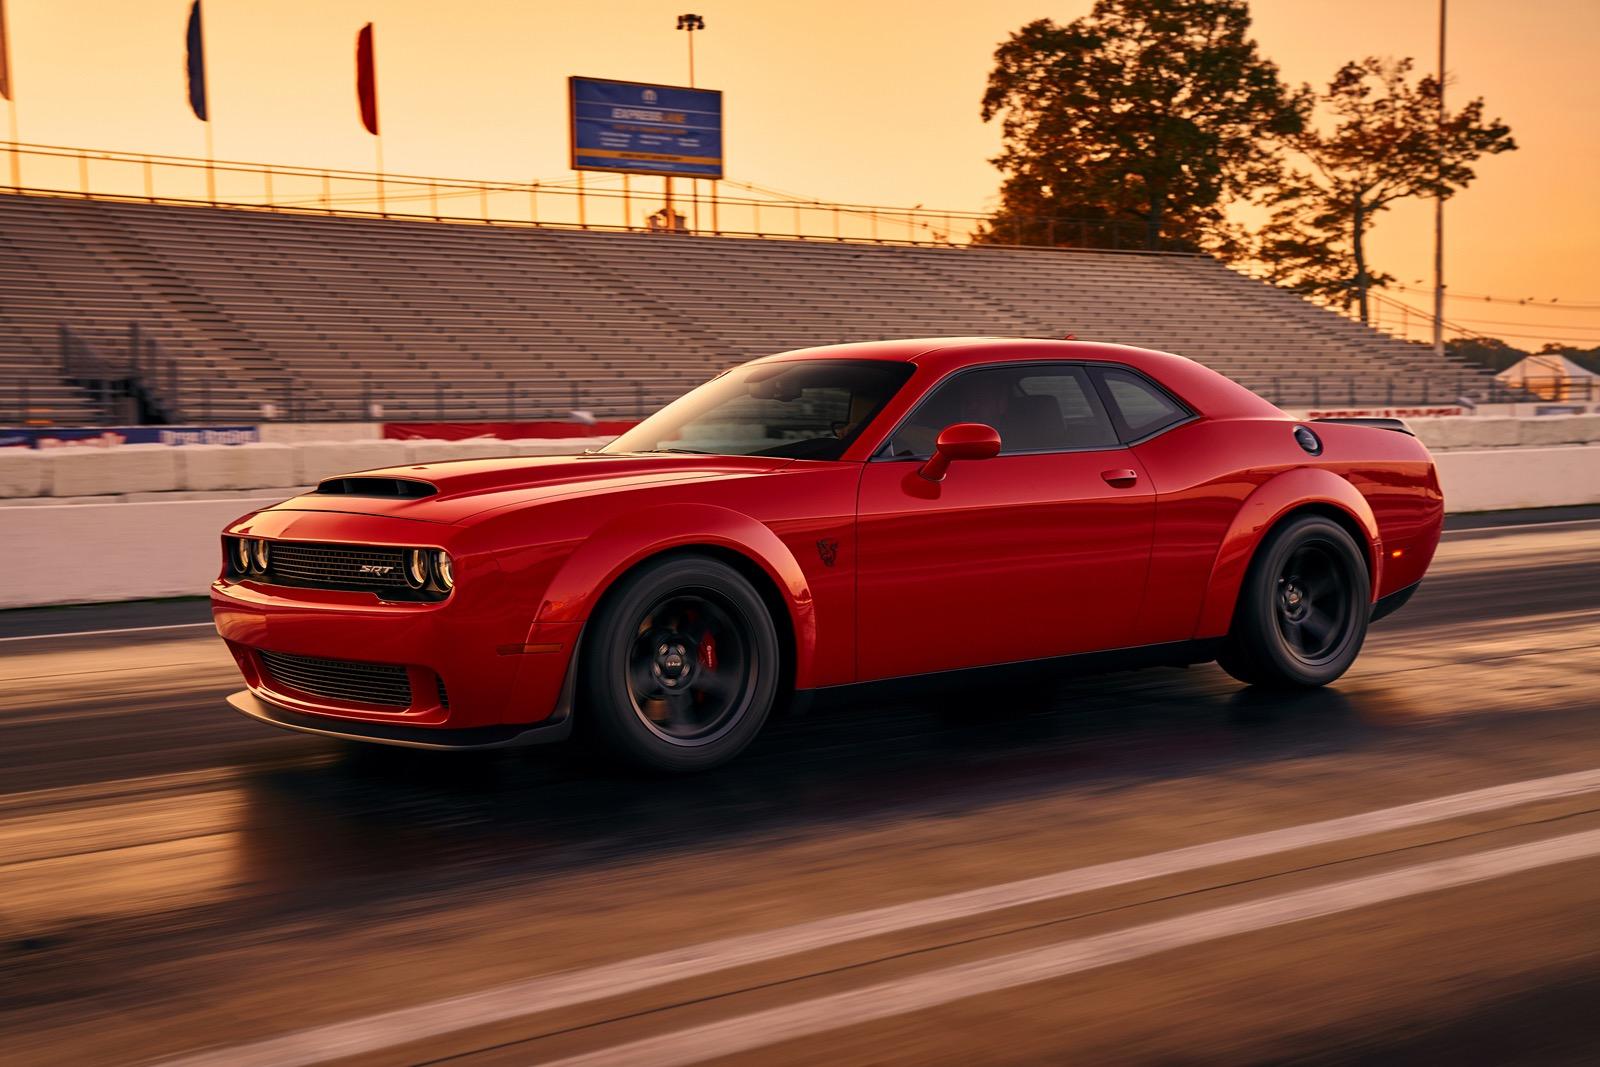 dodge hellcat demon speed Dodge Challenger SRT Demon revealed in first image